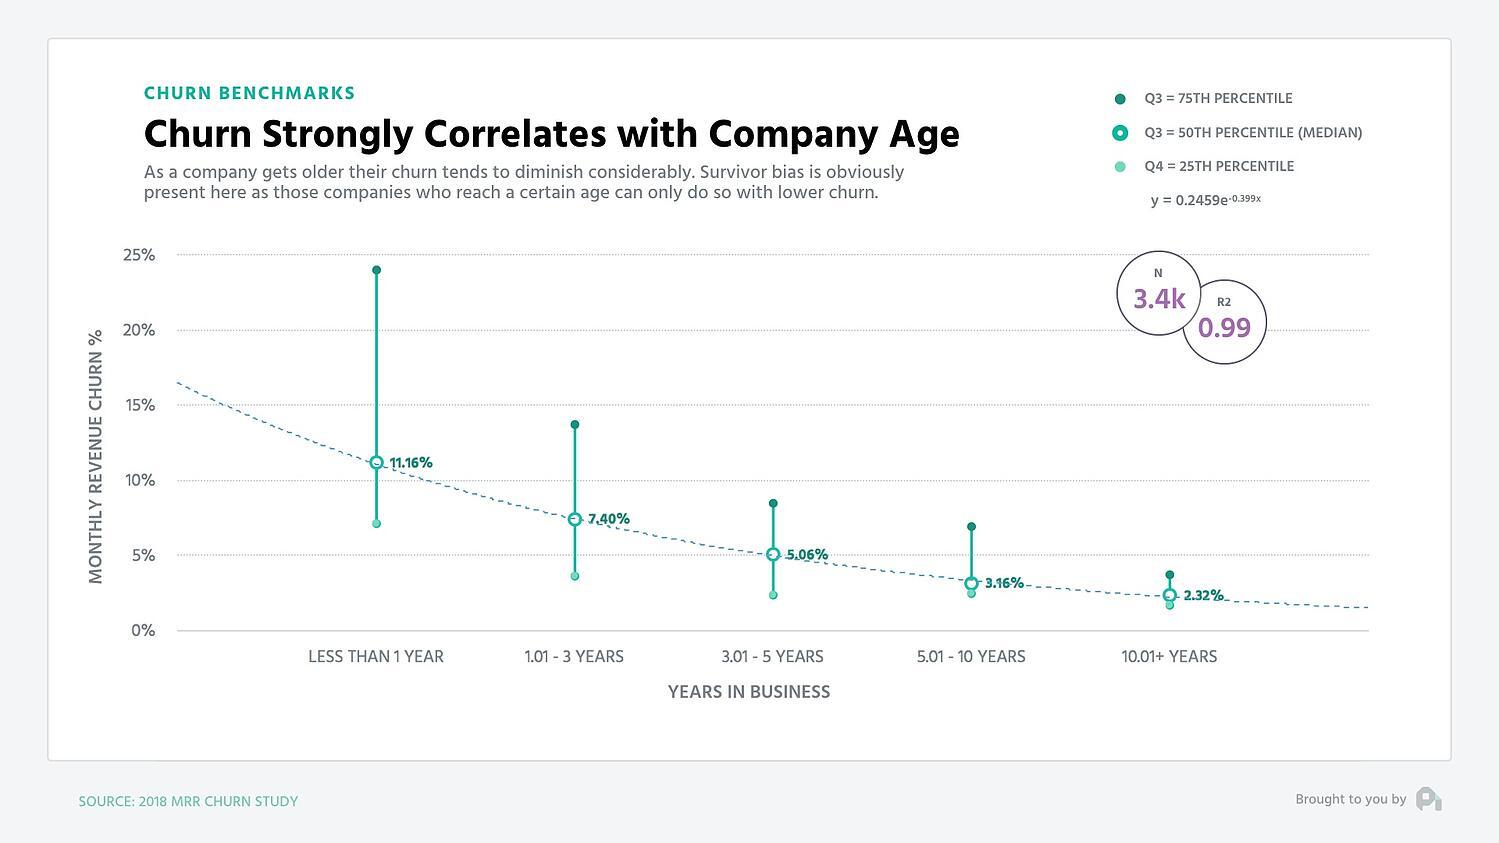 mrr churn benchmarks - company age